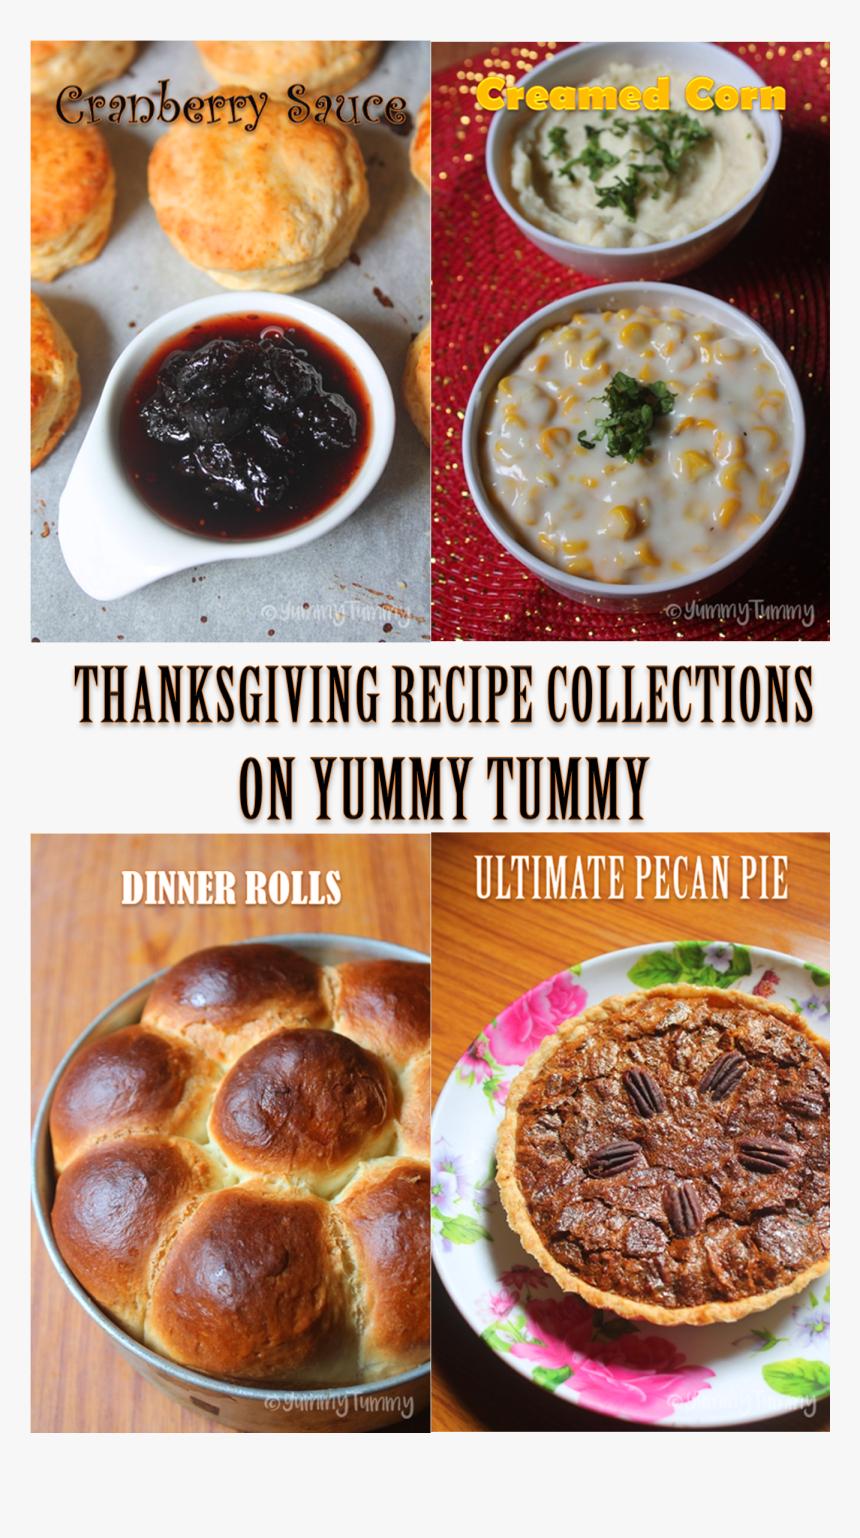 Thanksgiving Recipes Collection Pecan Pie Hd Png Download Transparent Png Image Pngitem